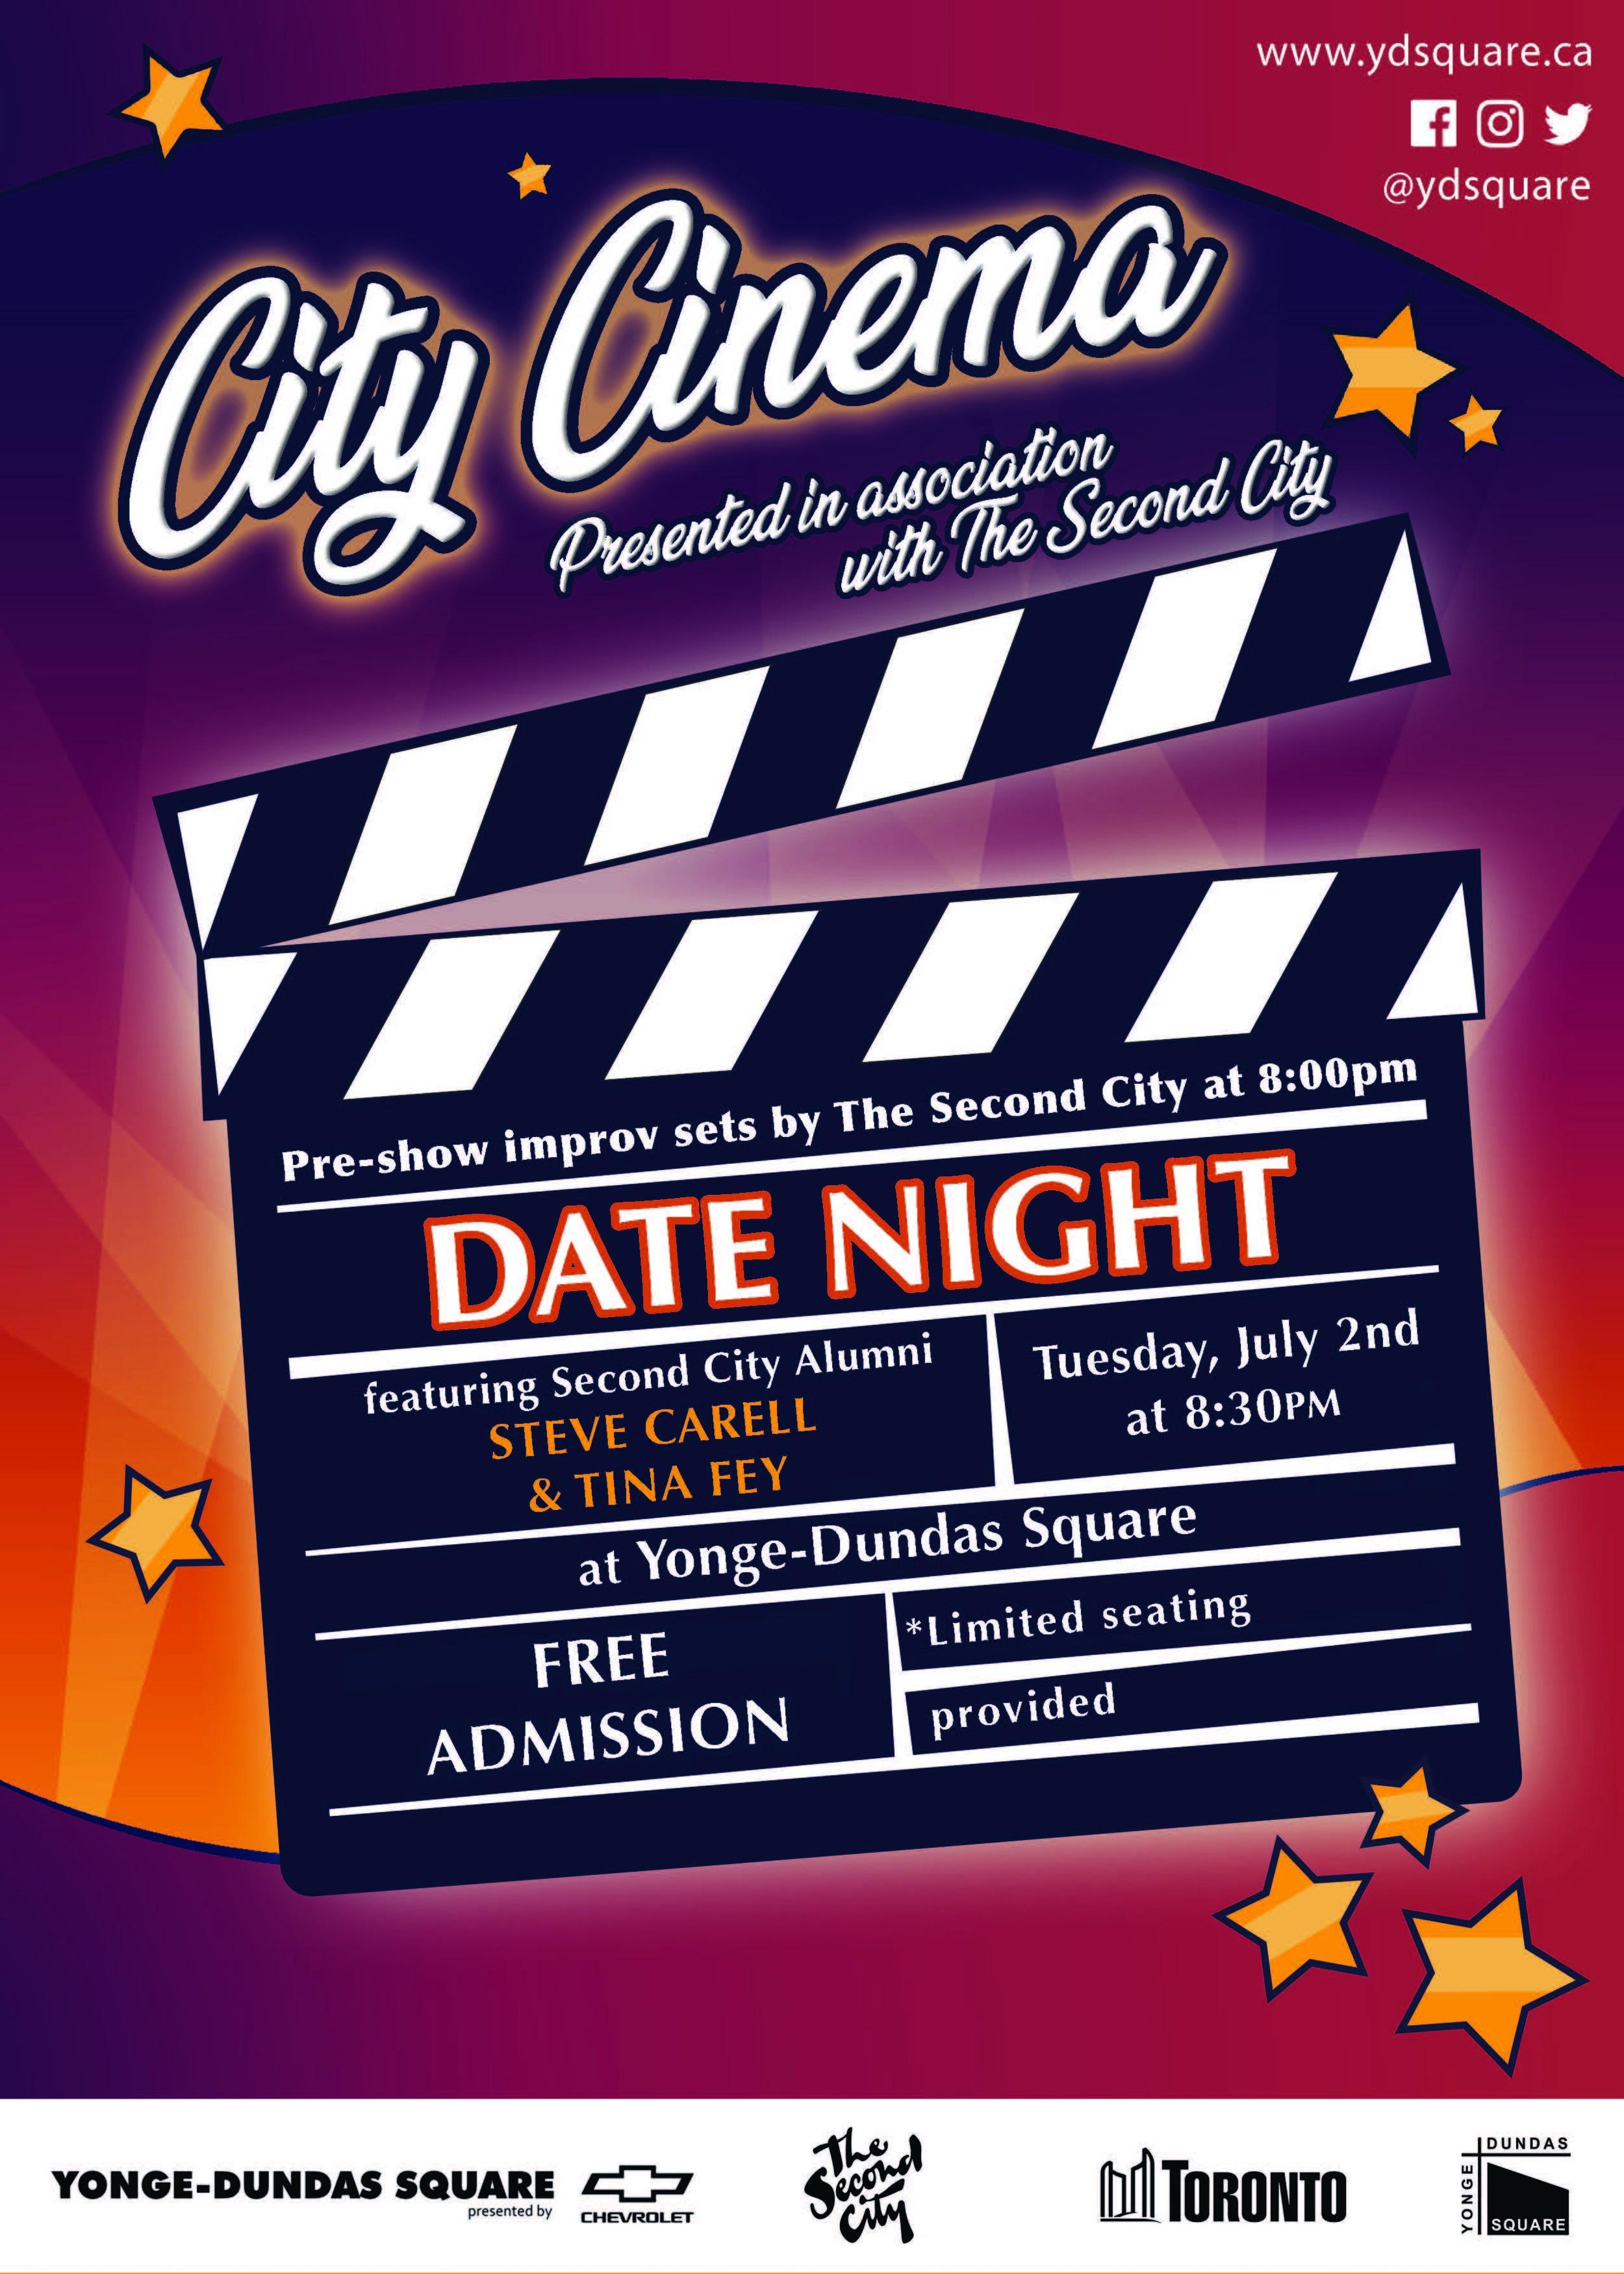 City Cinema Date Night Poster.jpg